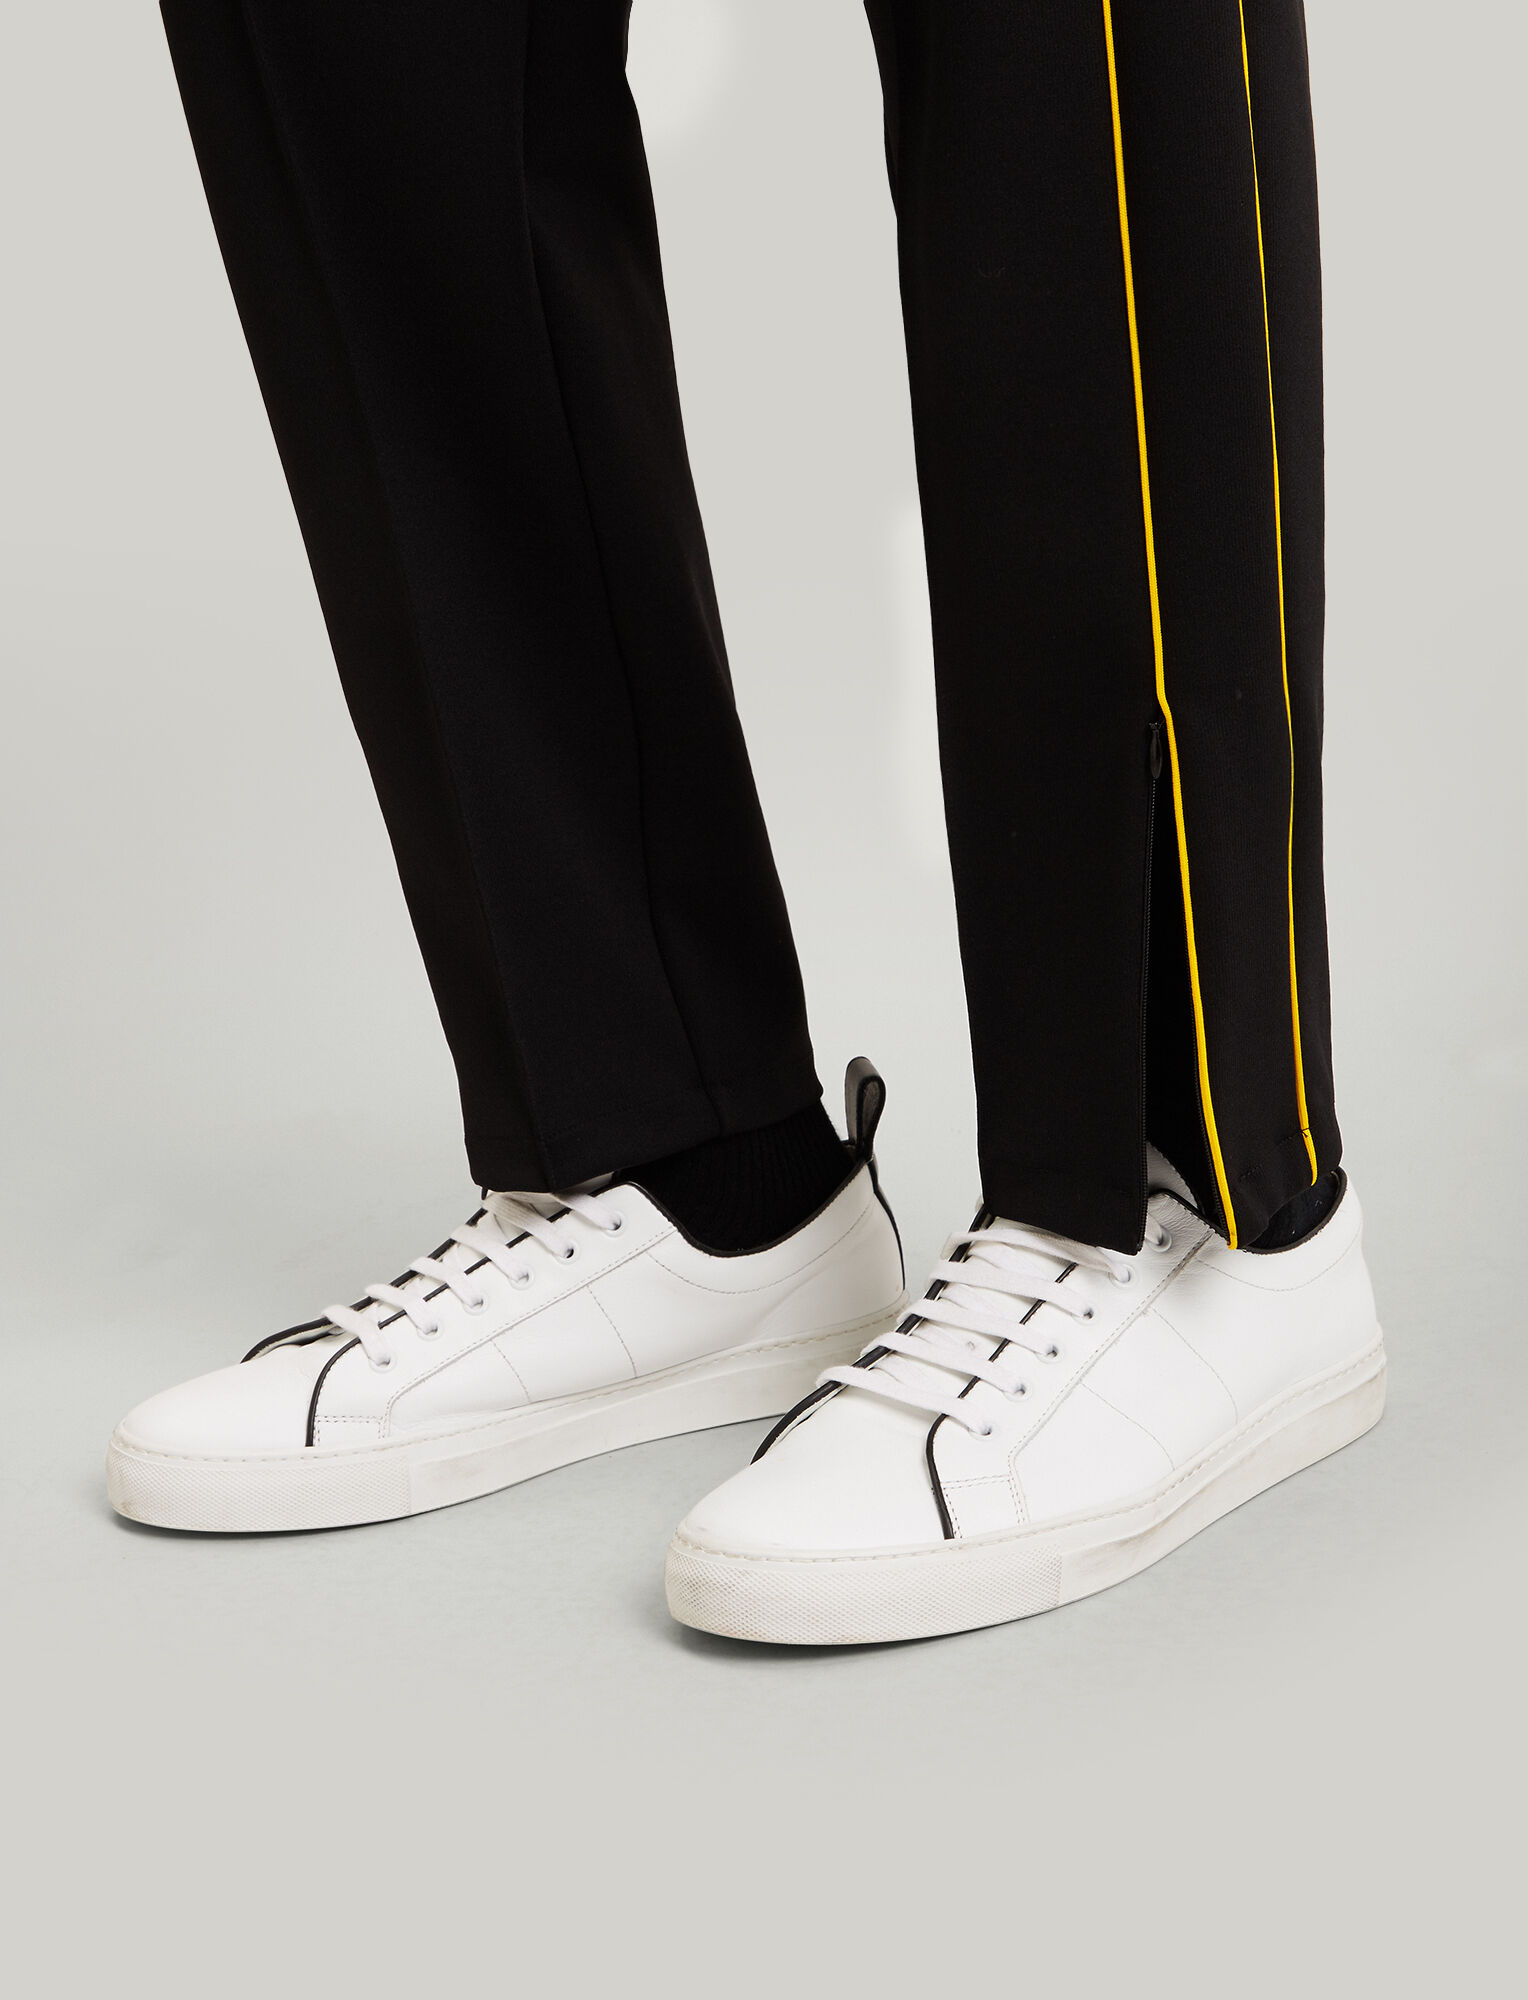 Joseph, Trackpants Technical Jersey, in BLACK